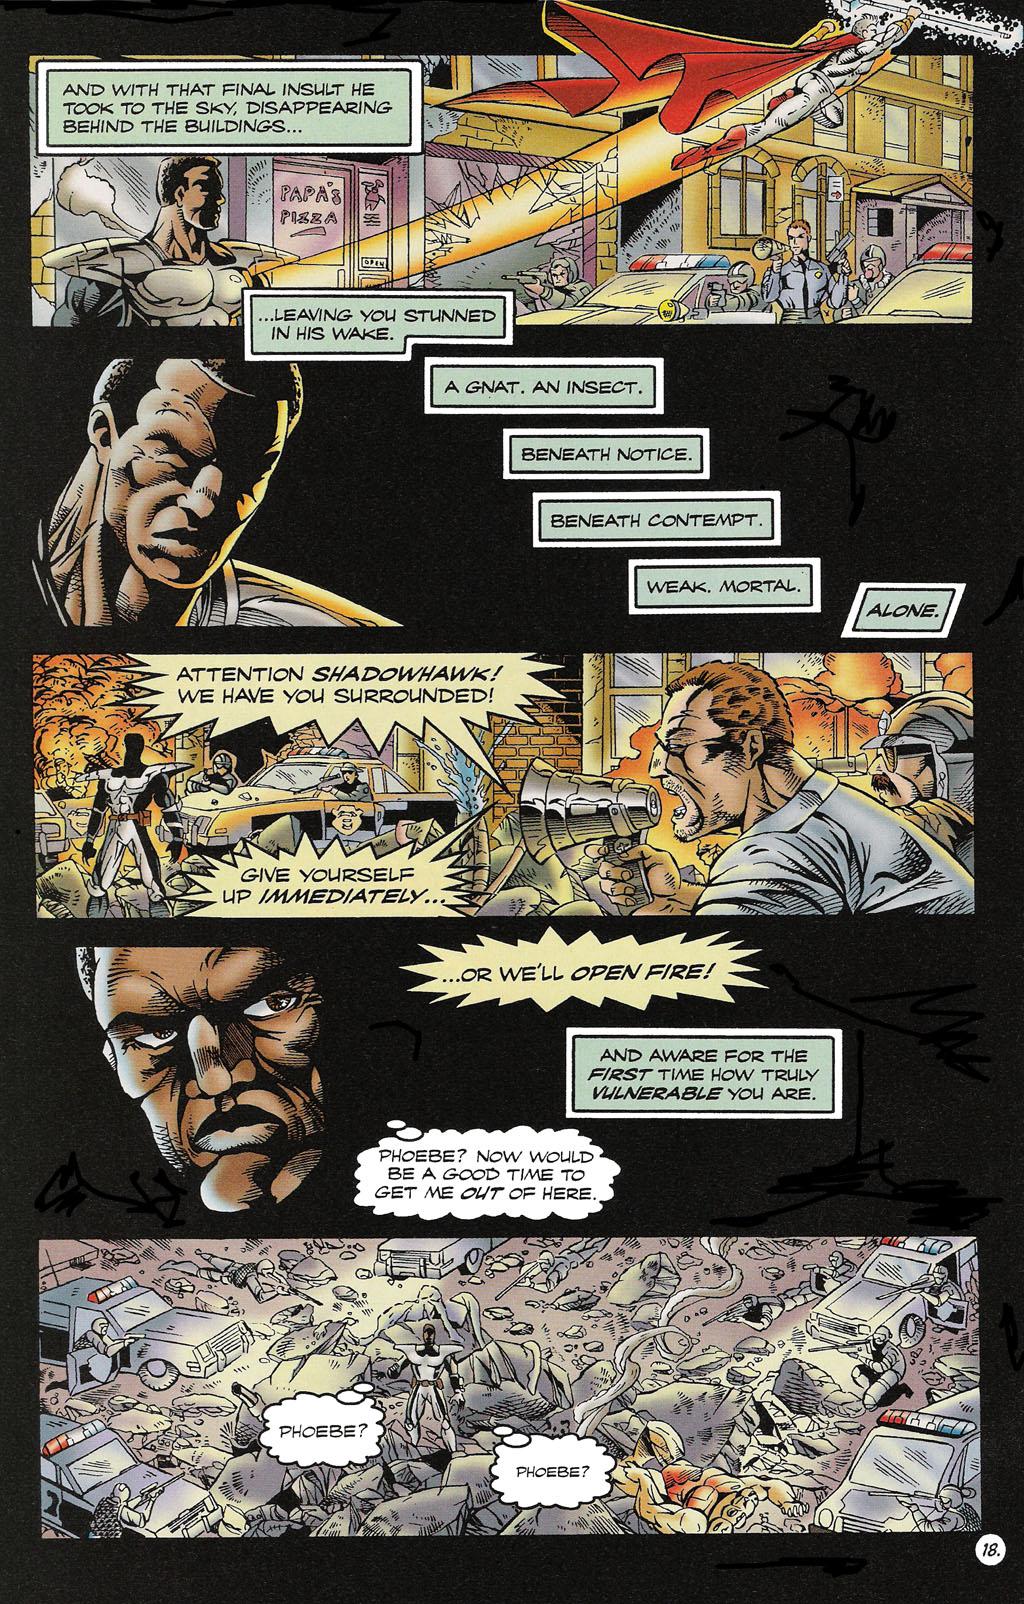 Read online ShadowHawk comic -  Issue #16 - 17